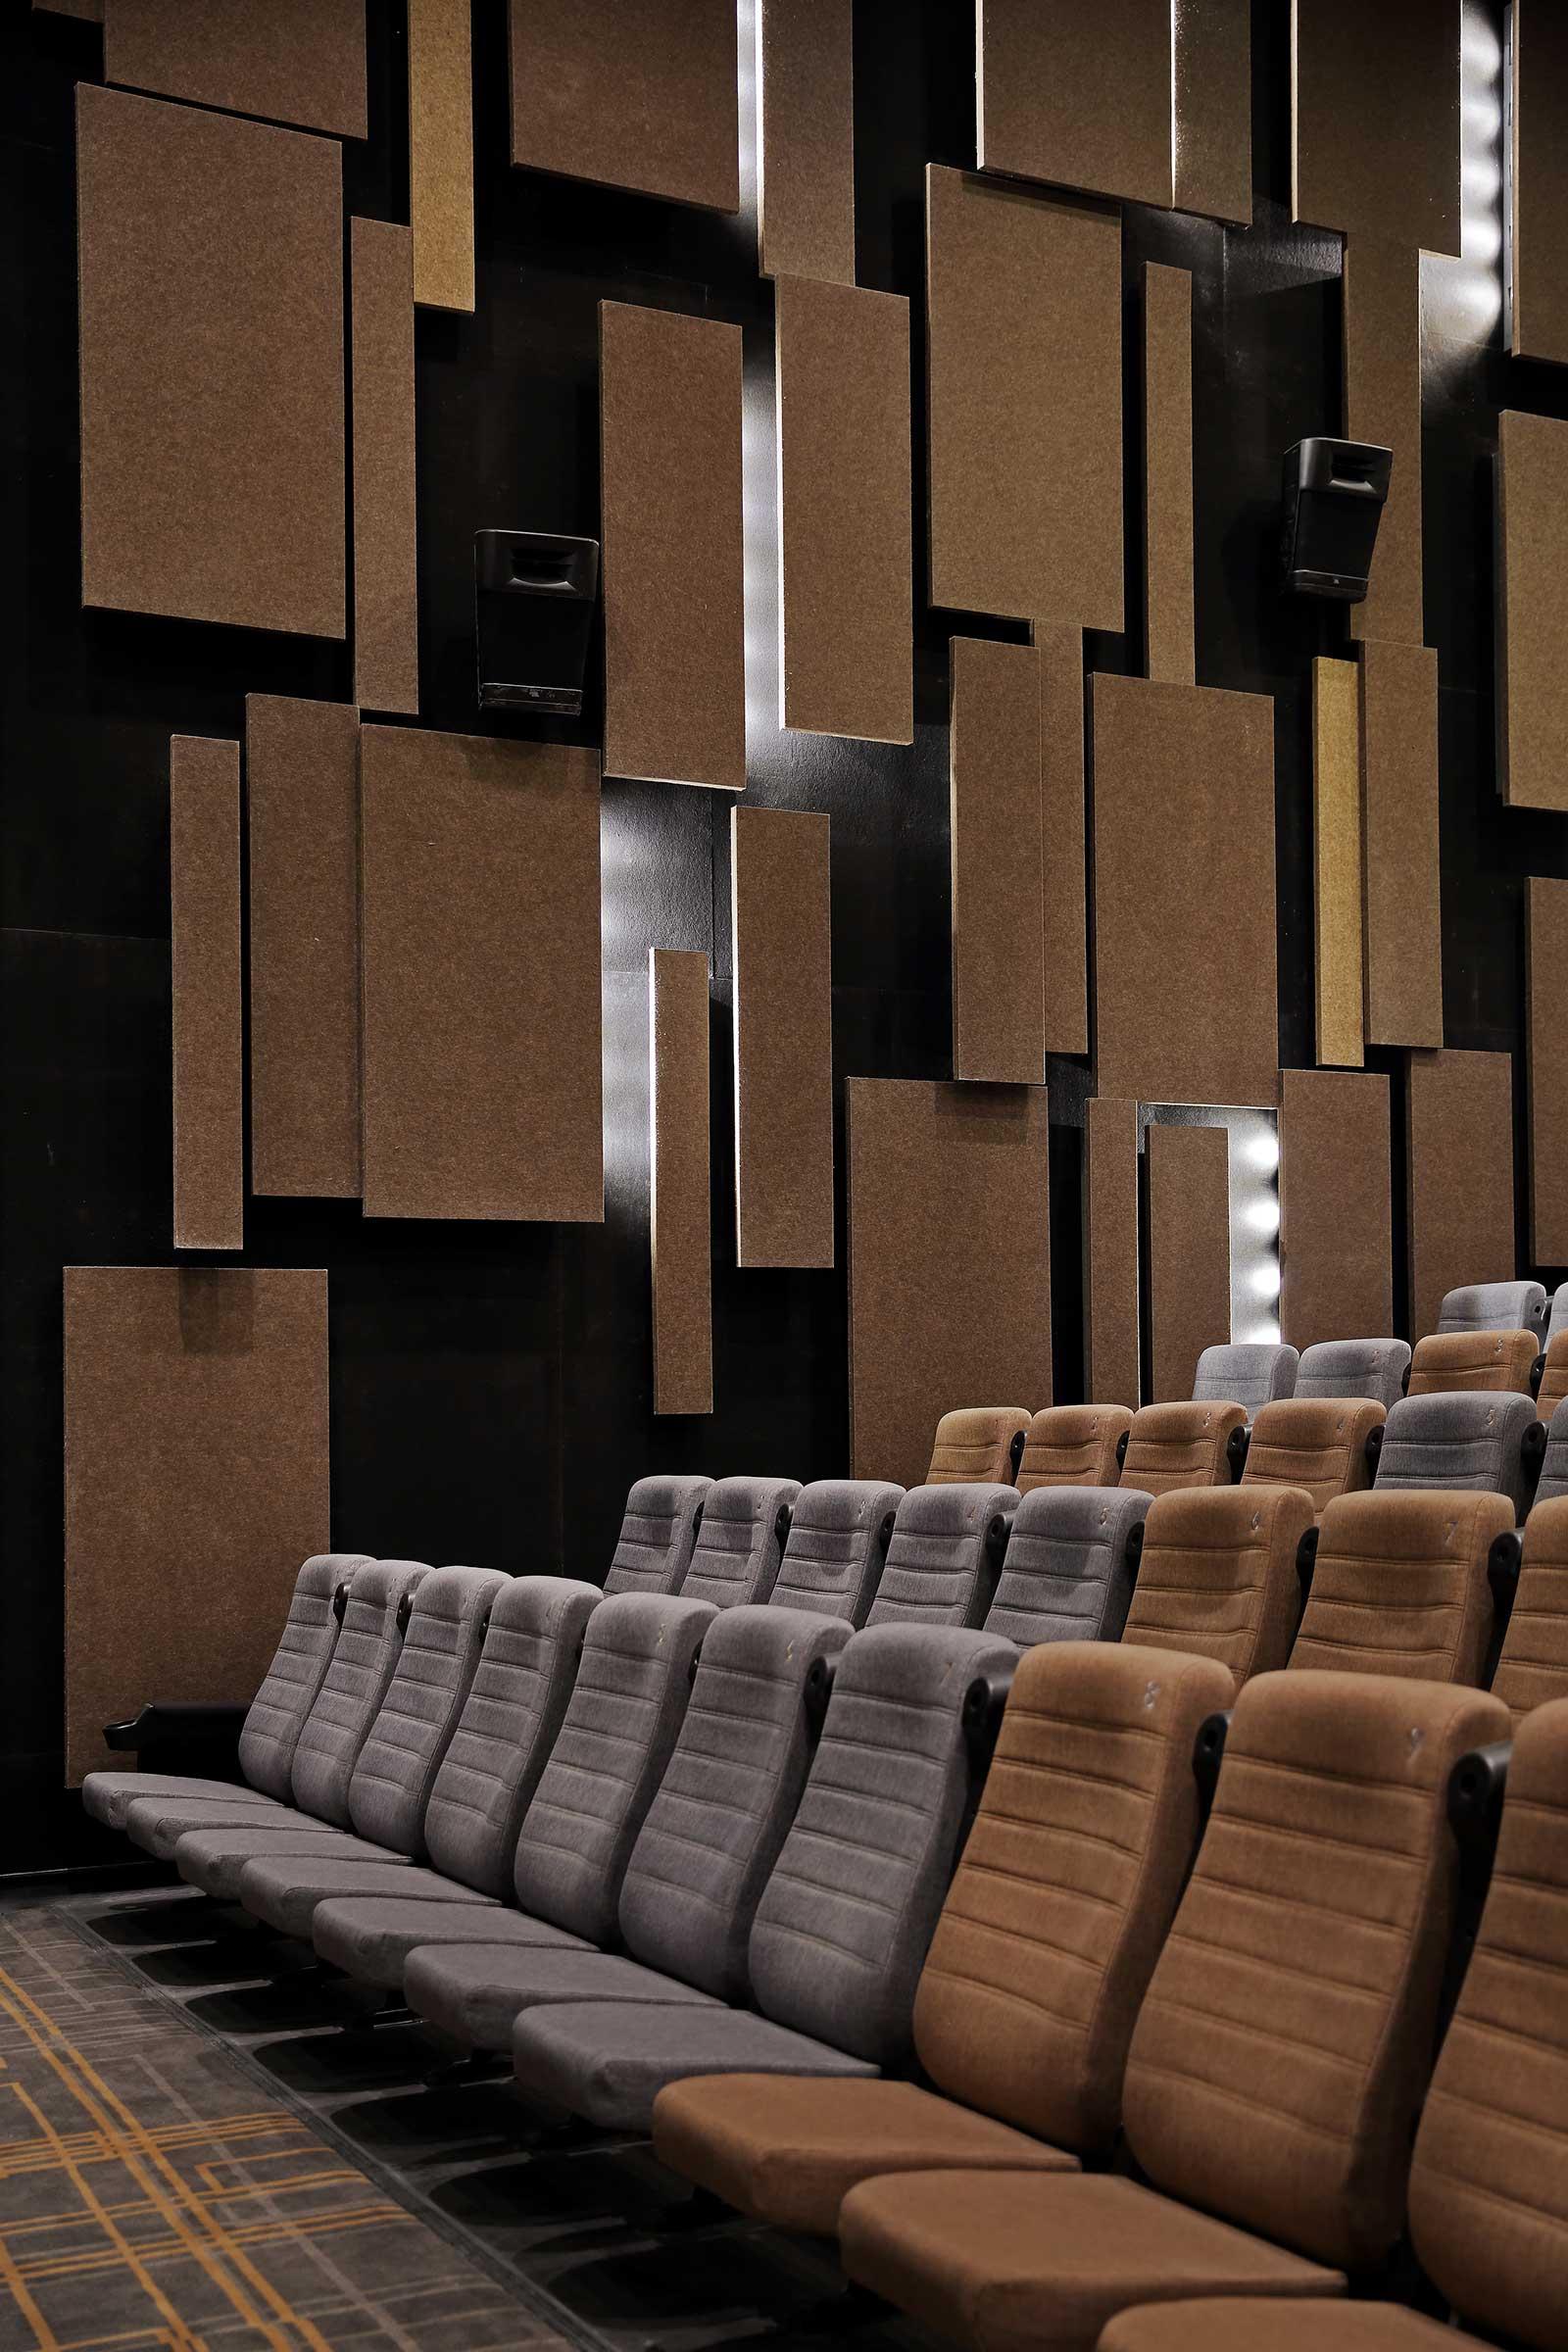 Xiangyang Fanyue Mall International Cinema. Images by Jonathan Leijonhufvud